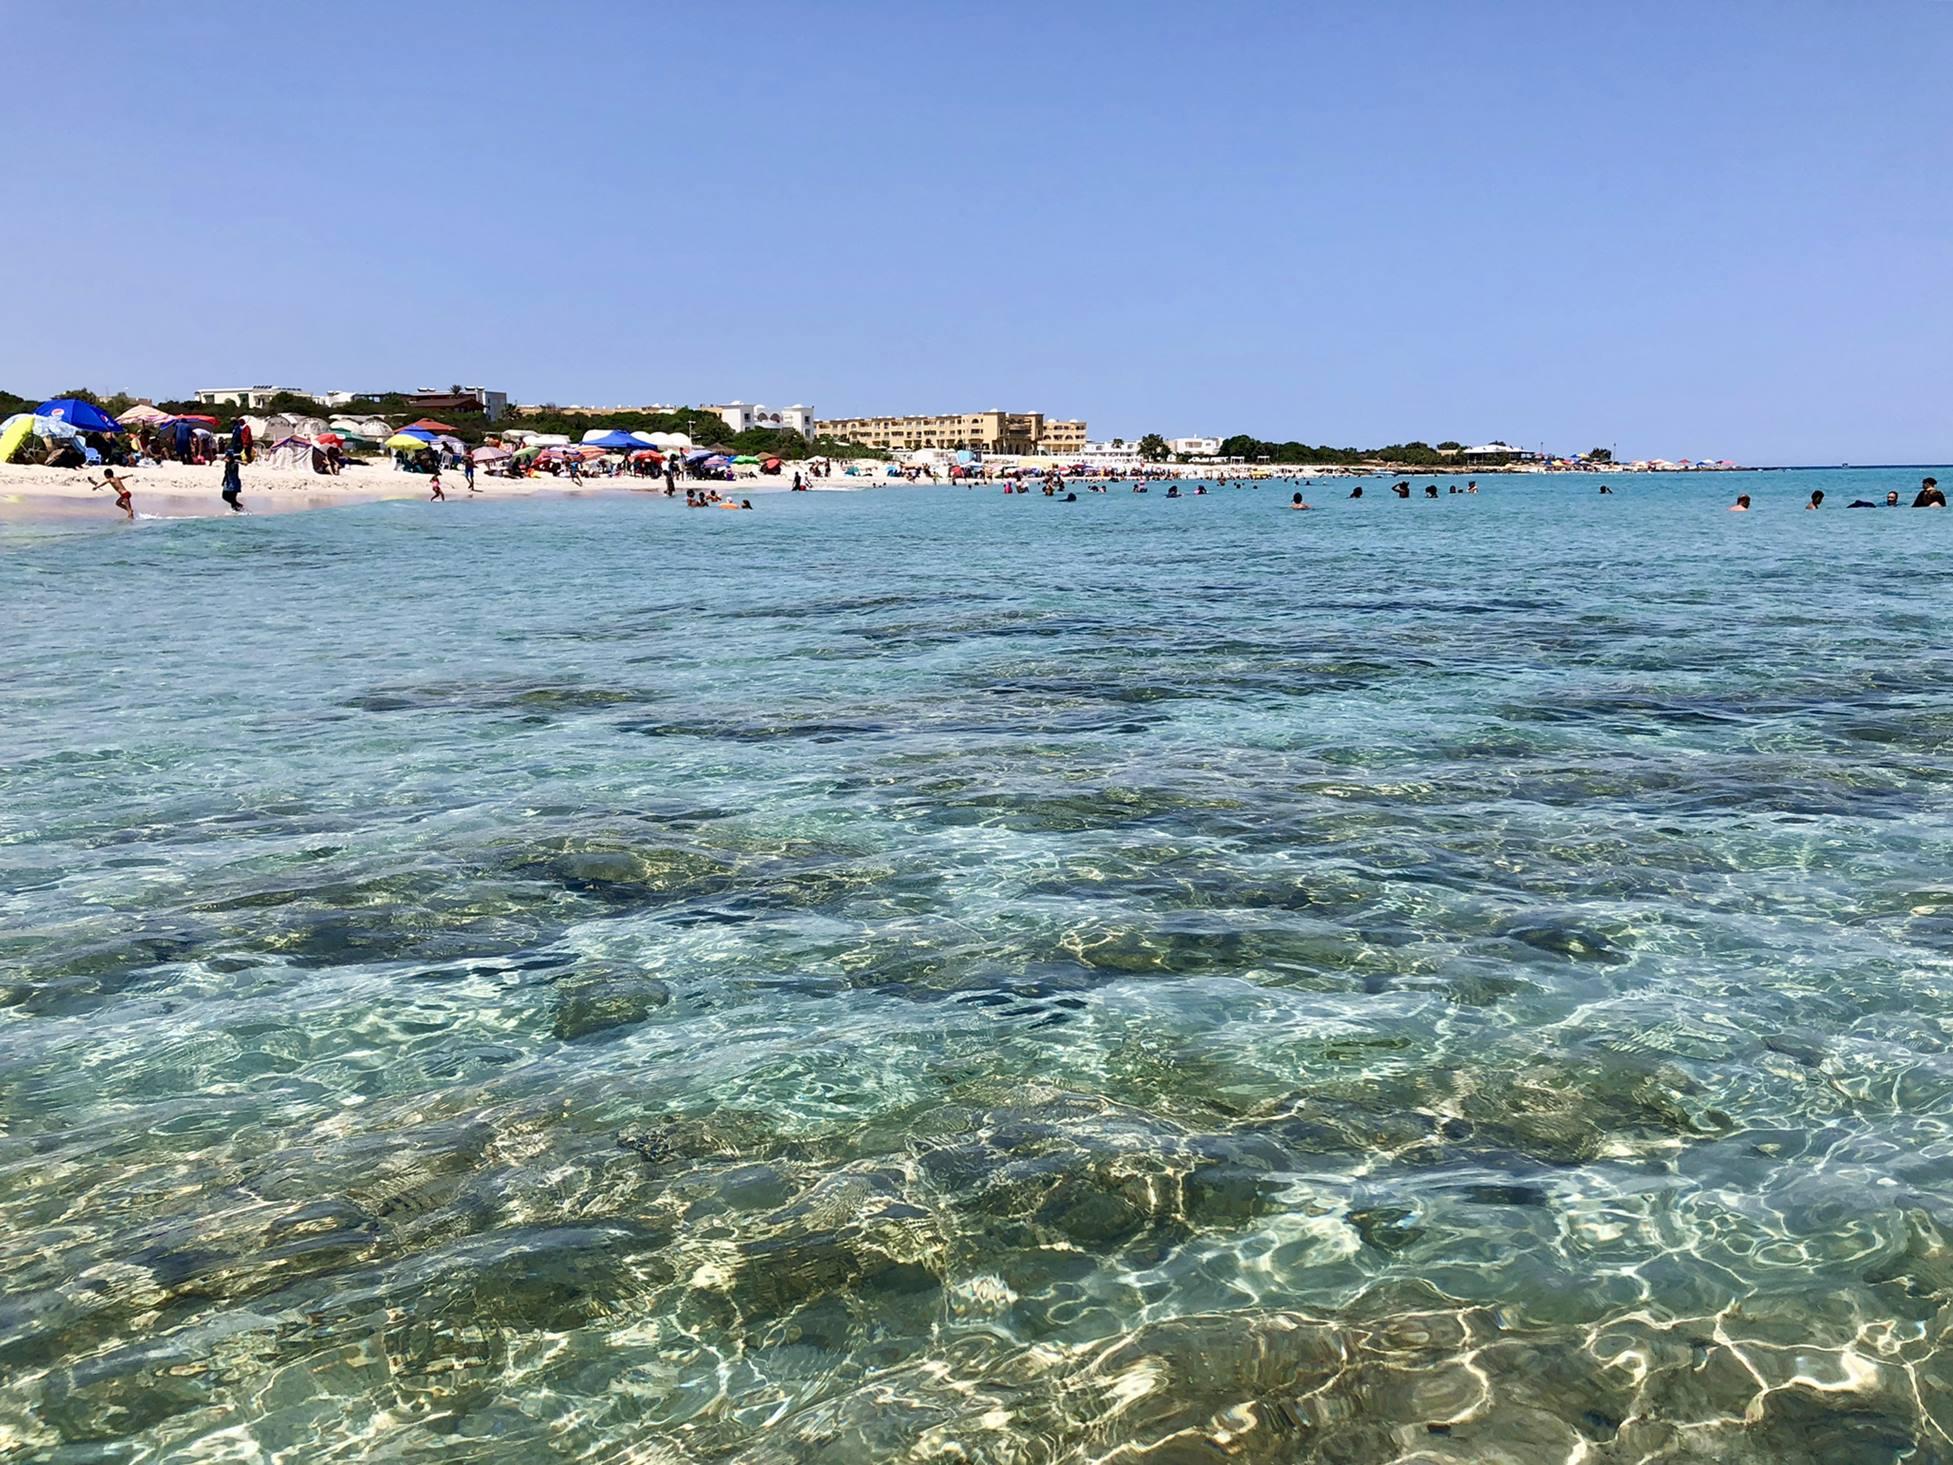 kelibia_tunisia_lamansourah_1